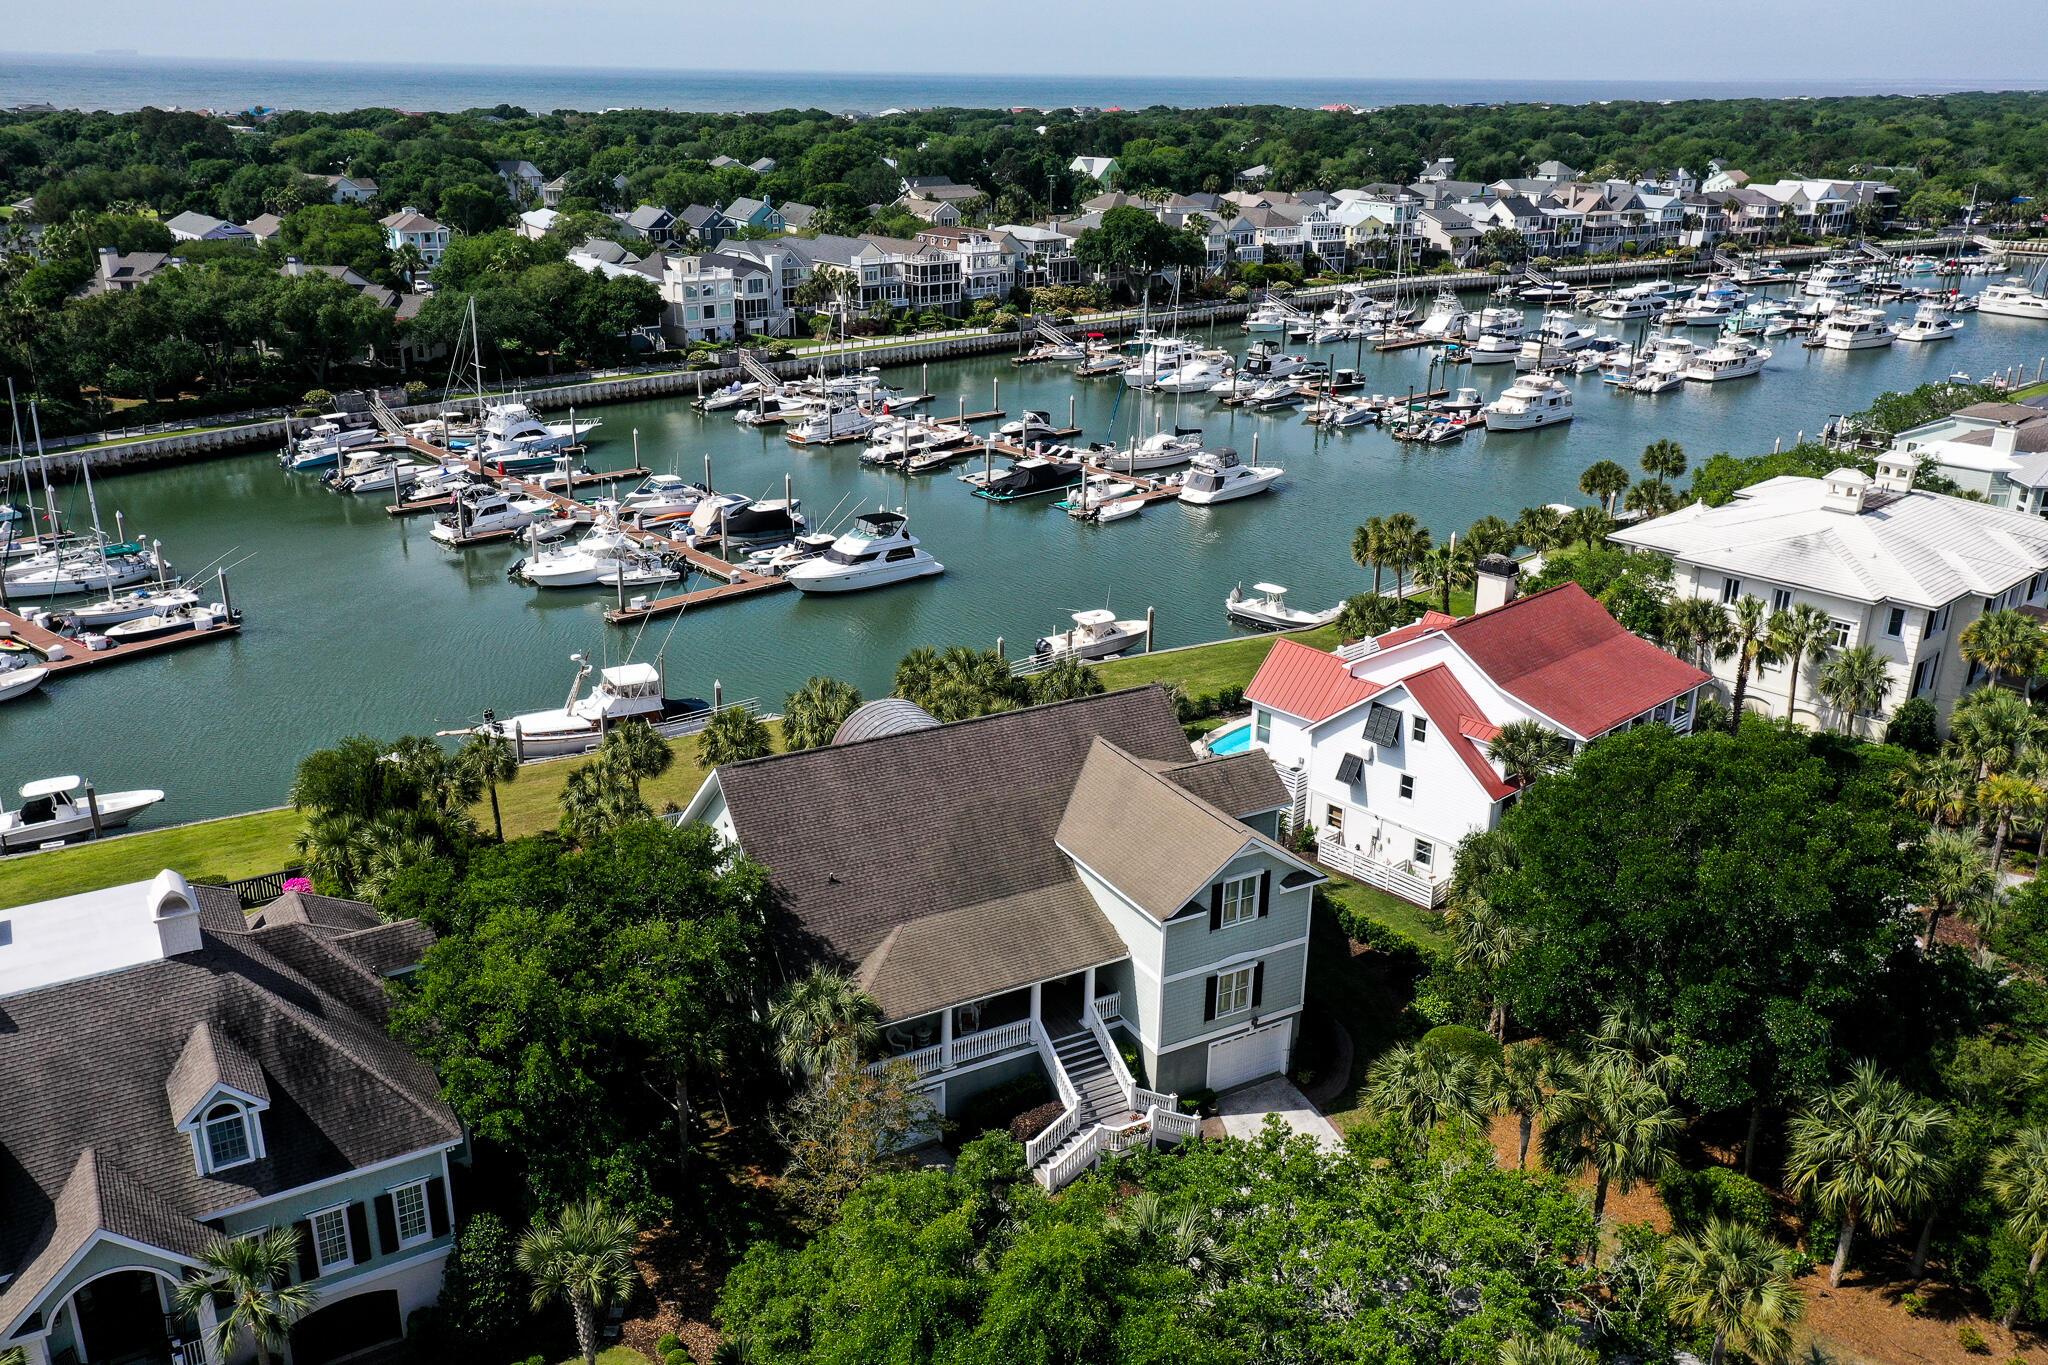 Waterway Island Homes For Sale - 42 Waterway Island Drive, Isle of Palms, SC - 32